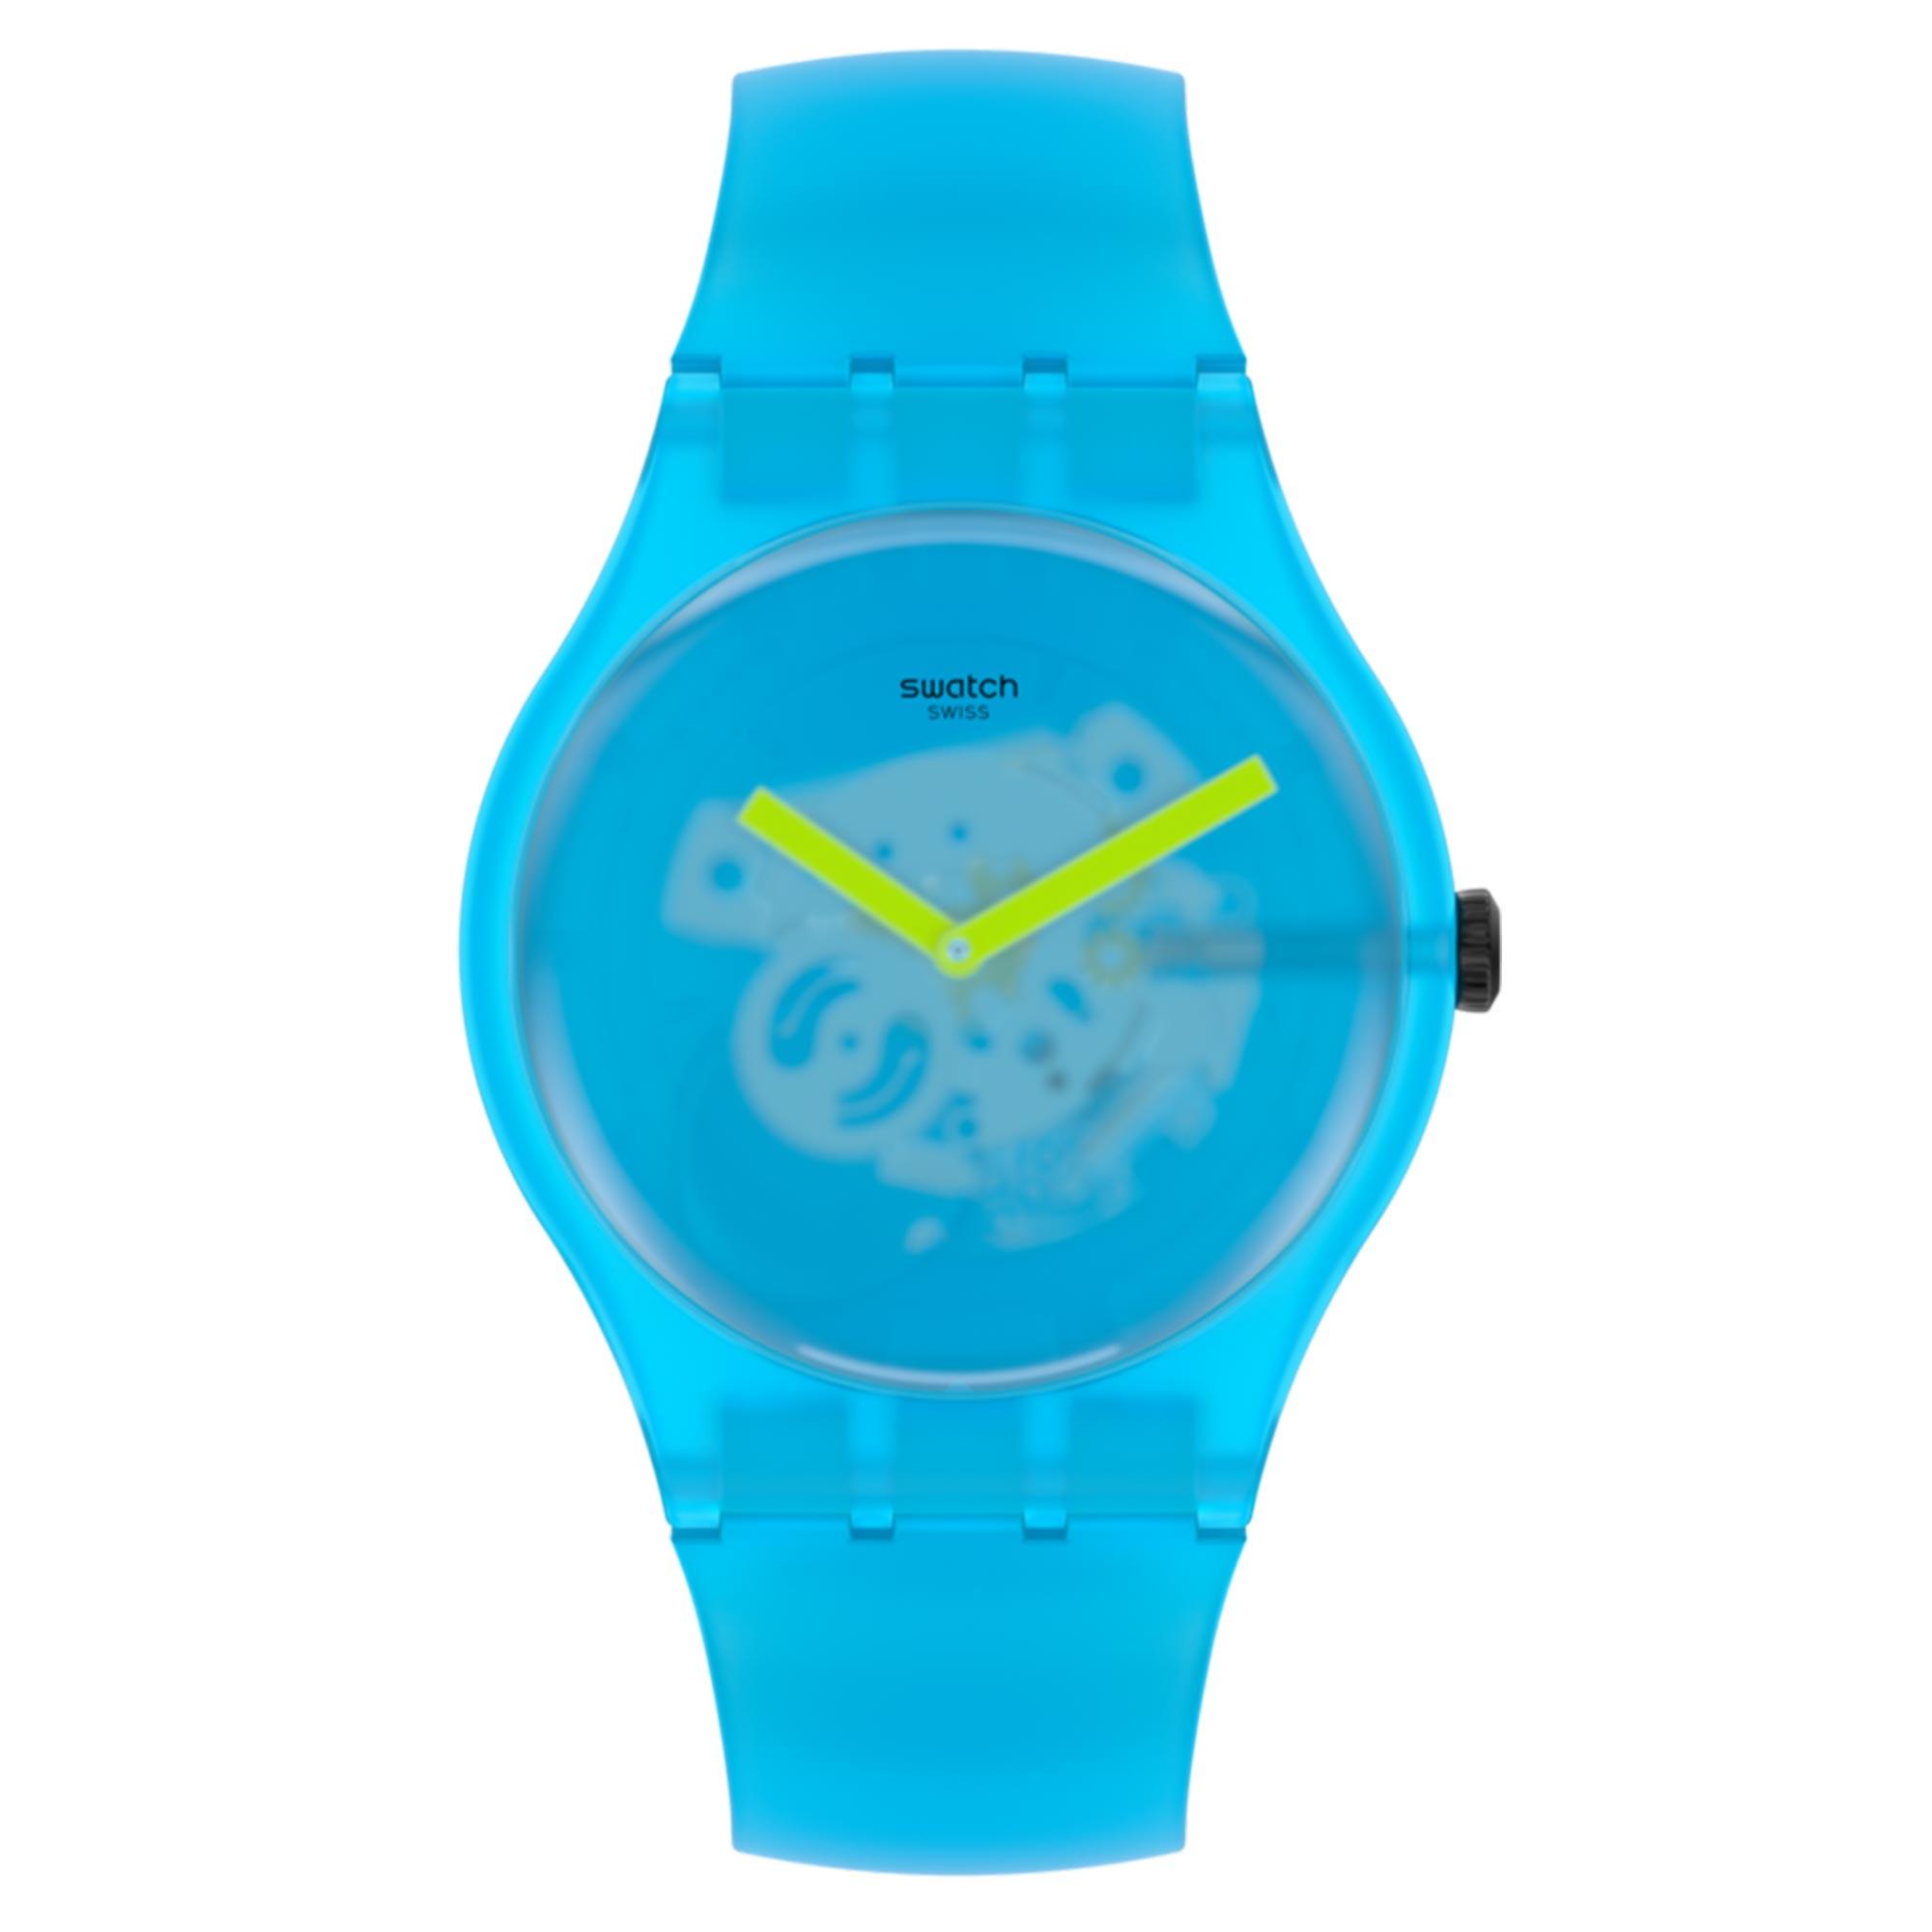 Swatch New Gent Quartz Transparent Dial Blue Silicone Strap Watch SUOS112